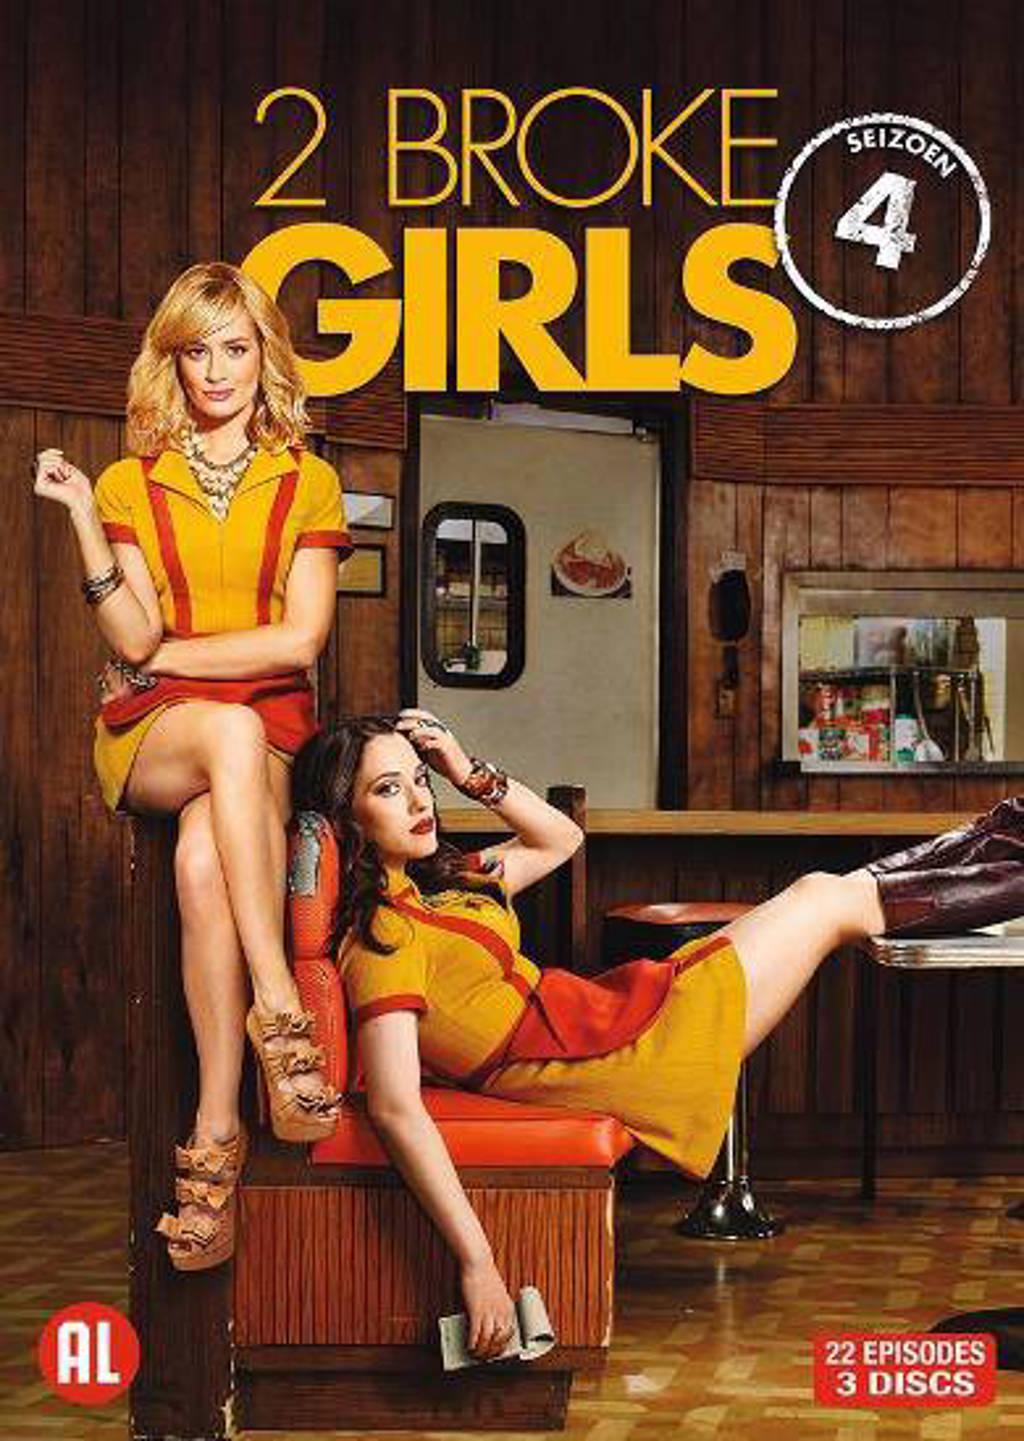 2 broke girls - Seizoen 4 (DVD)